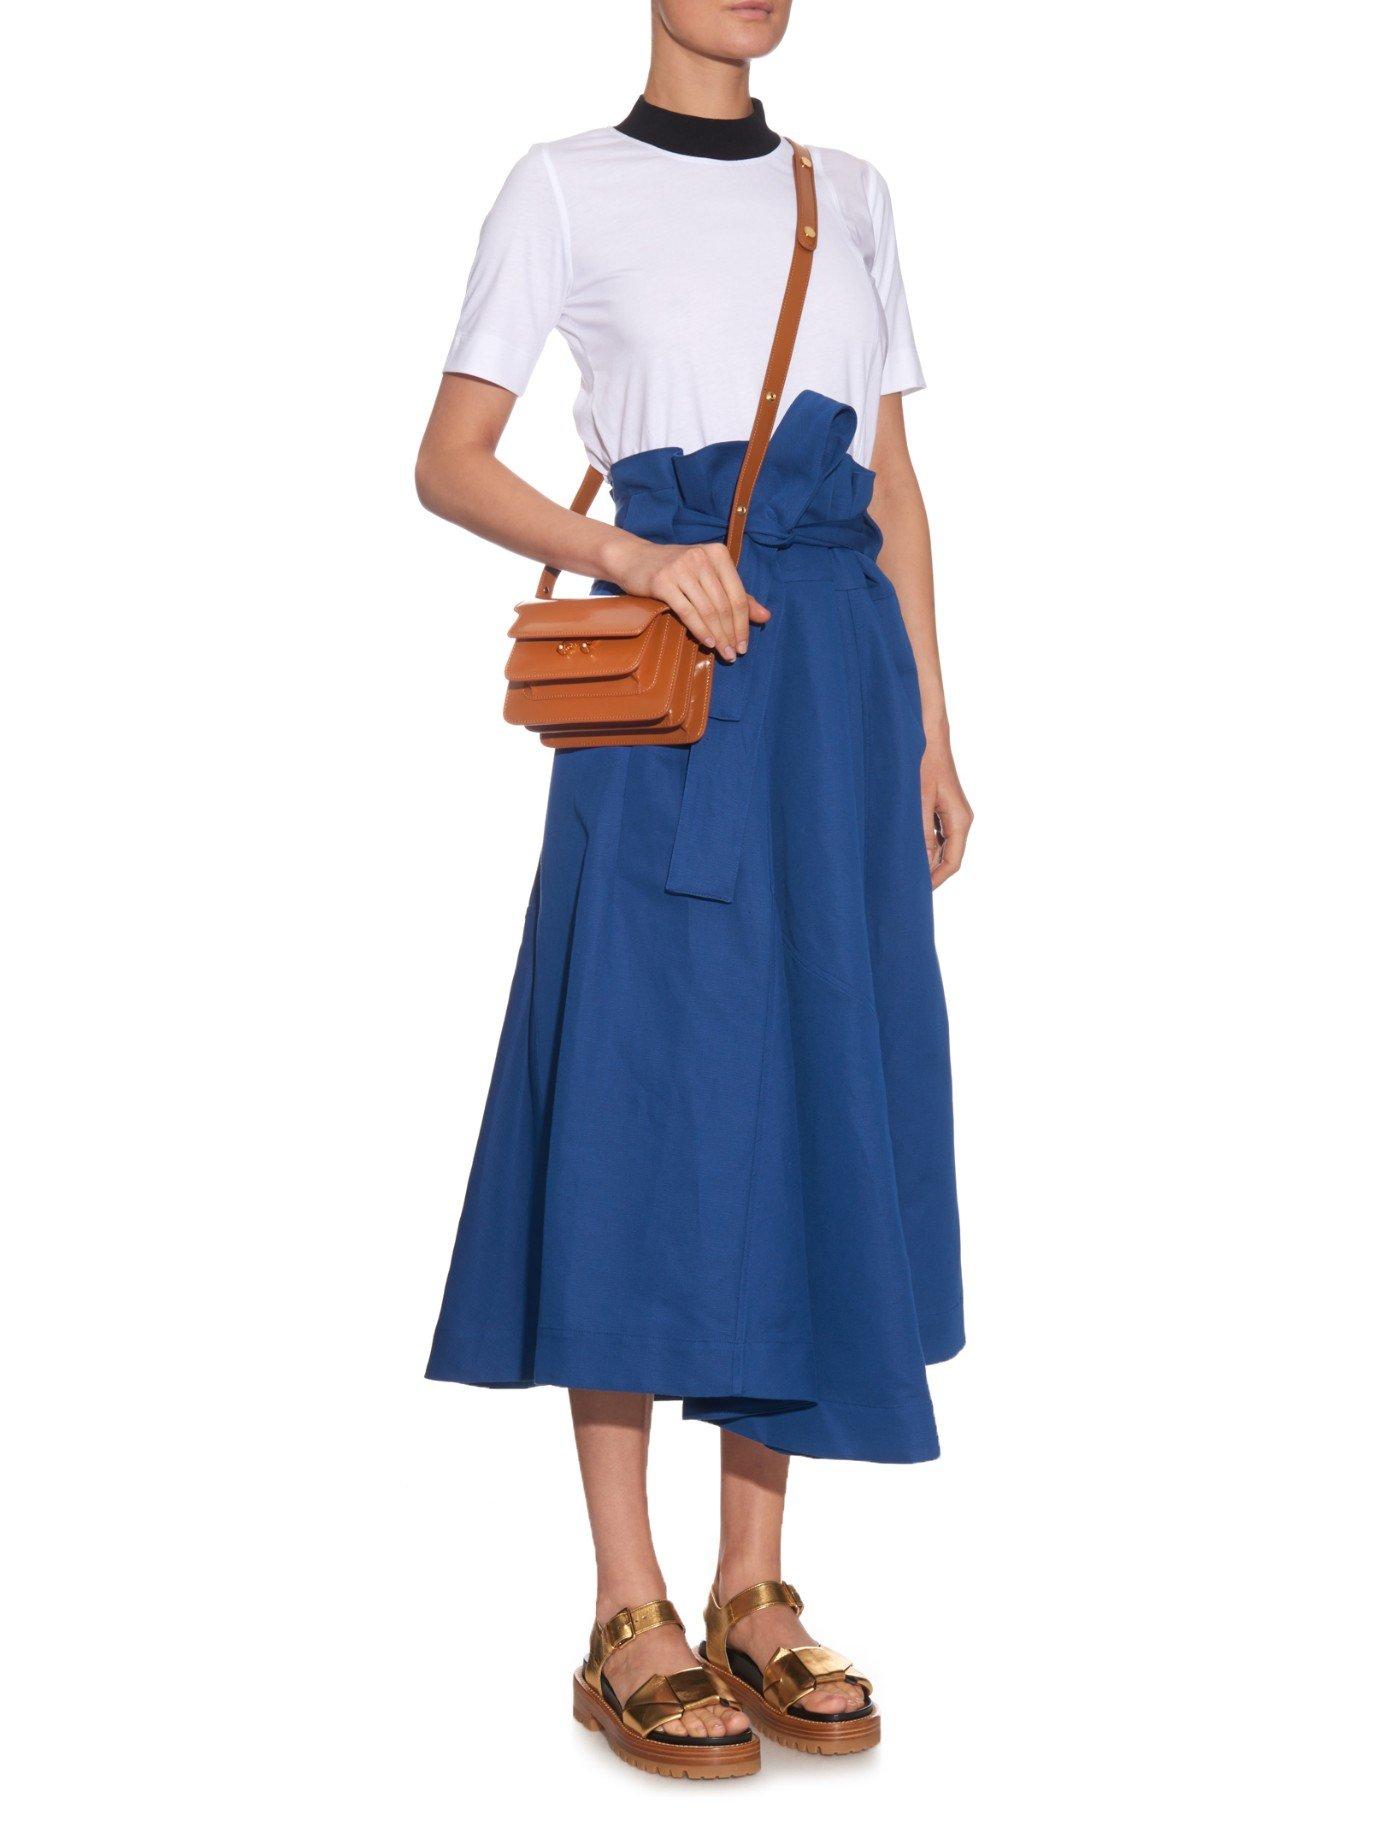 Lyst - Marni Trunk Mini Leather Shoulder Bag in Brown c90e4efaf7b53